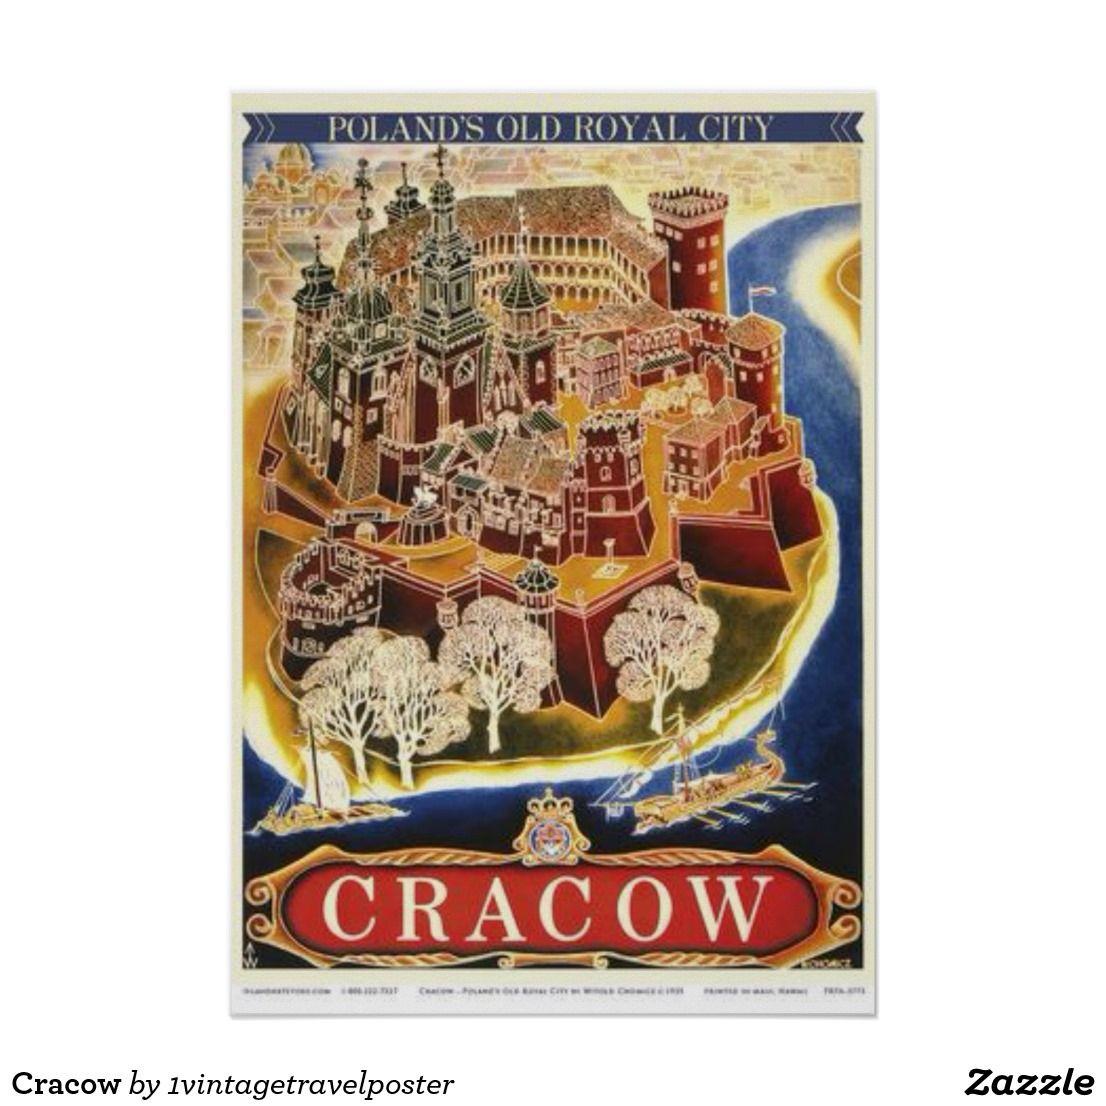 Vintage Travel poster Brisbane QLD Canvas Print paintingTourism for glass frame